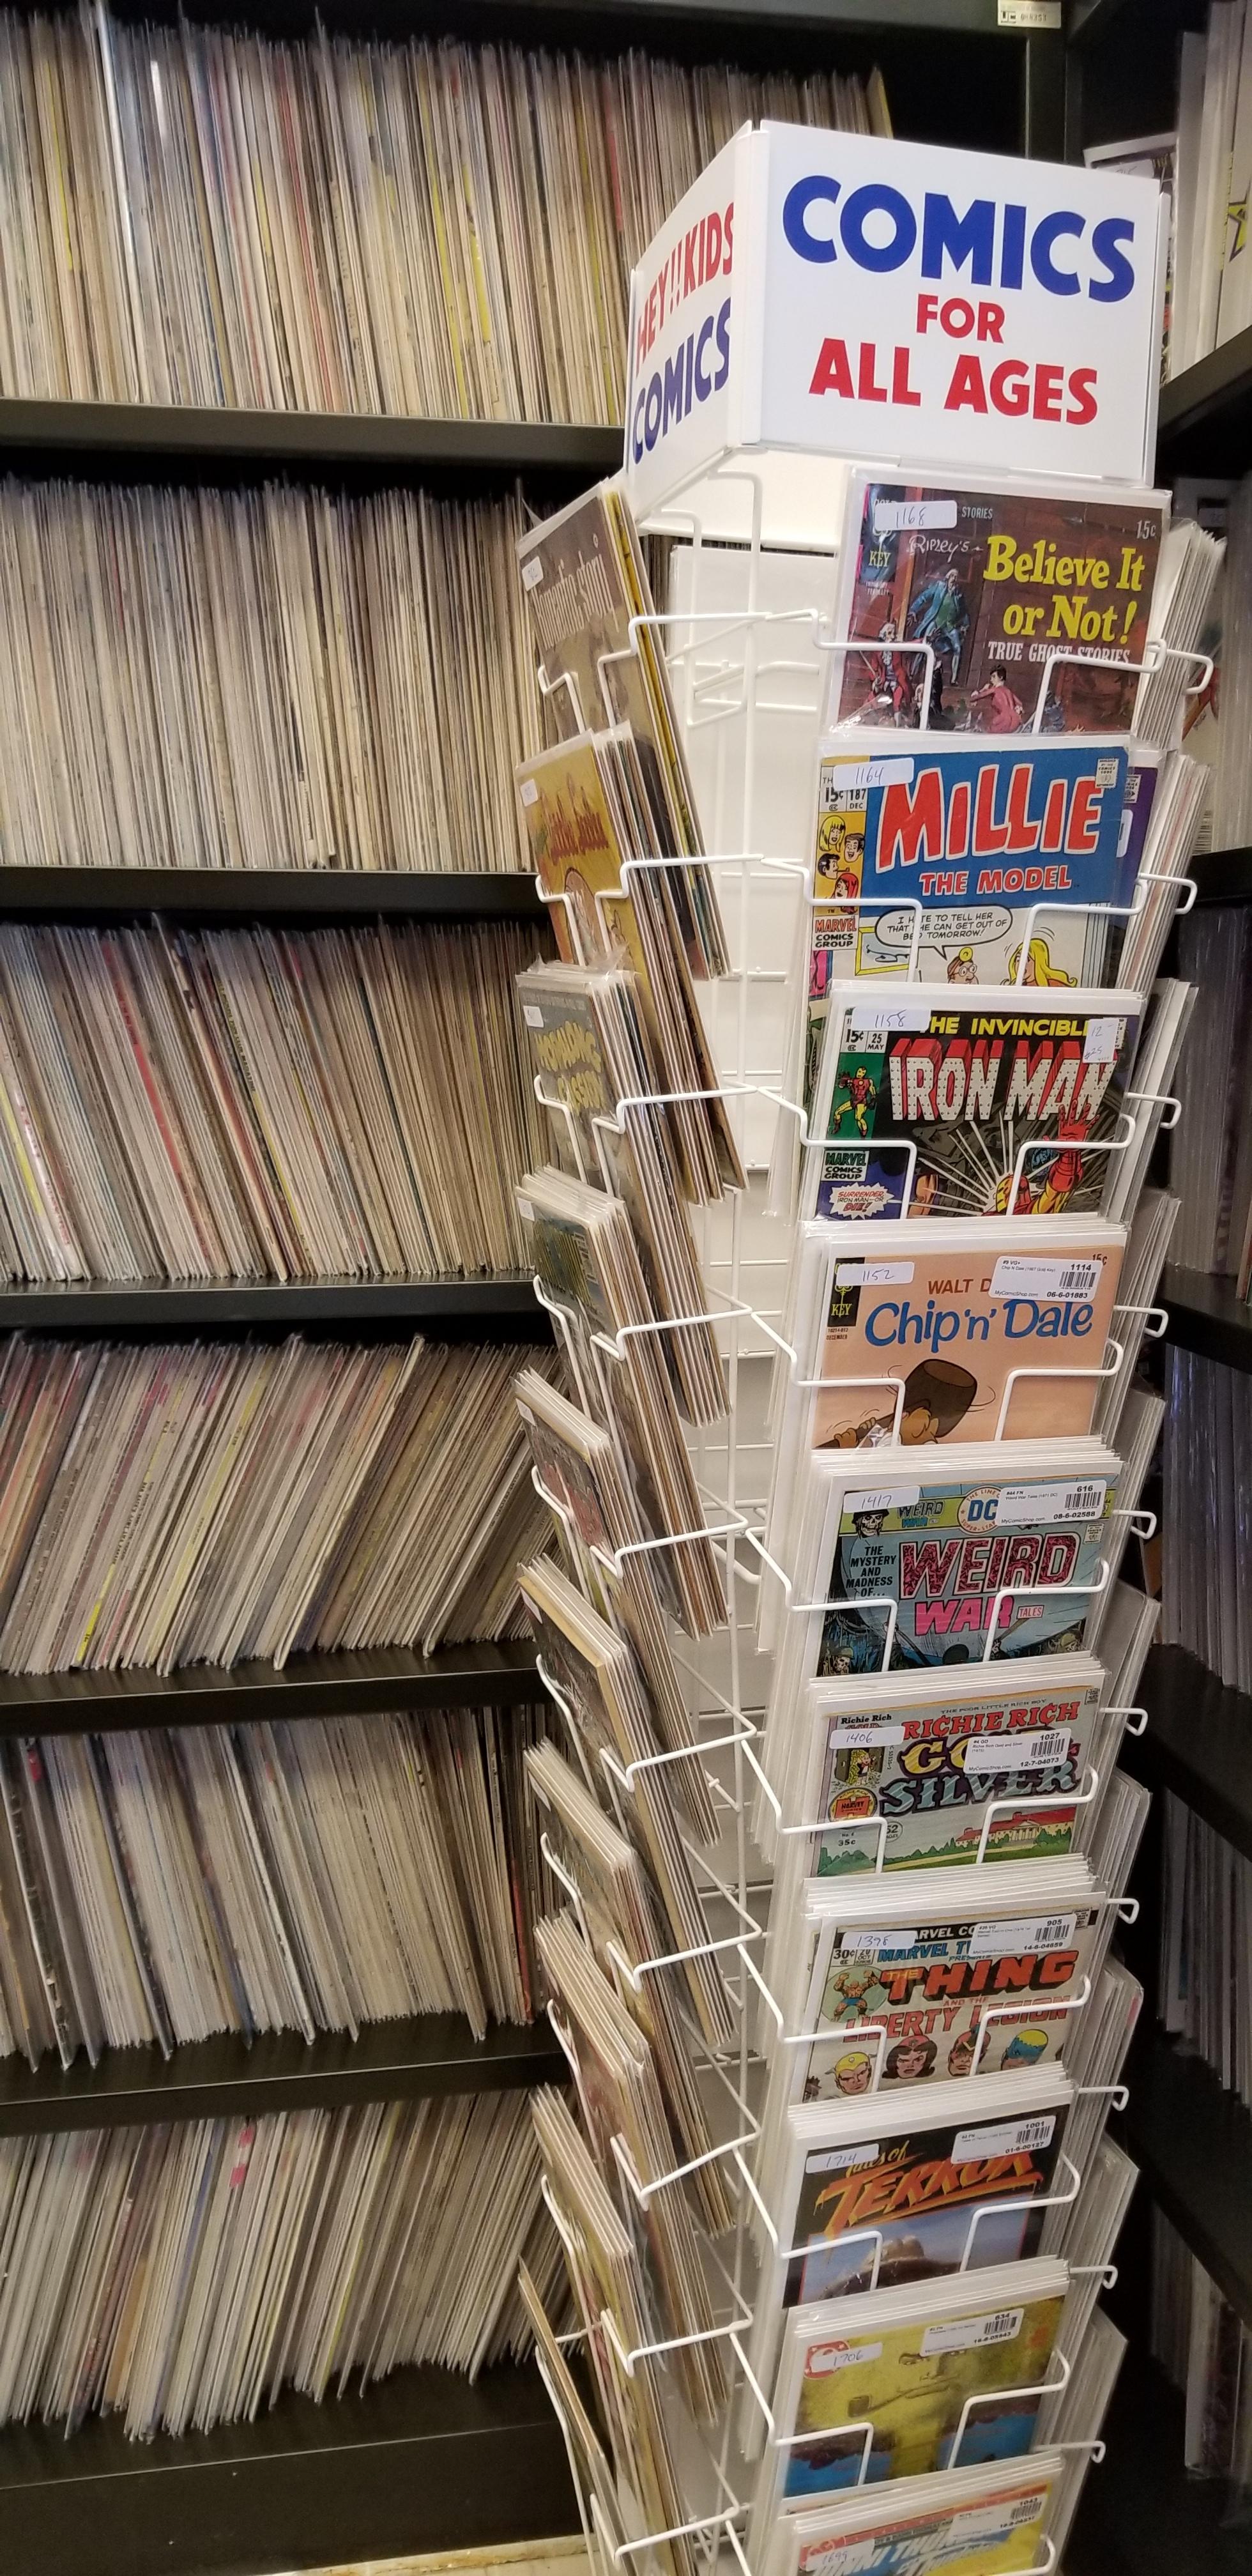 Ugly industrial shelving, wonderful spinner rack, so many comic books.